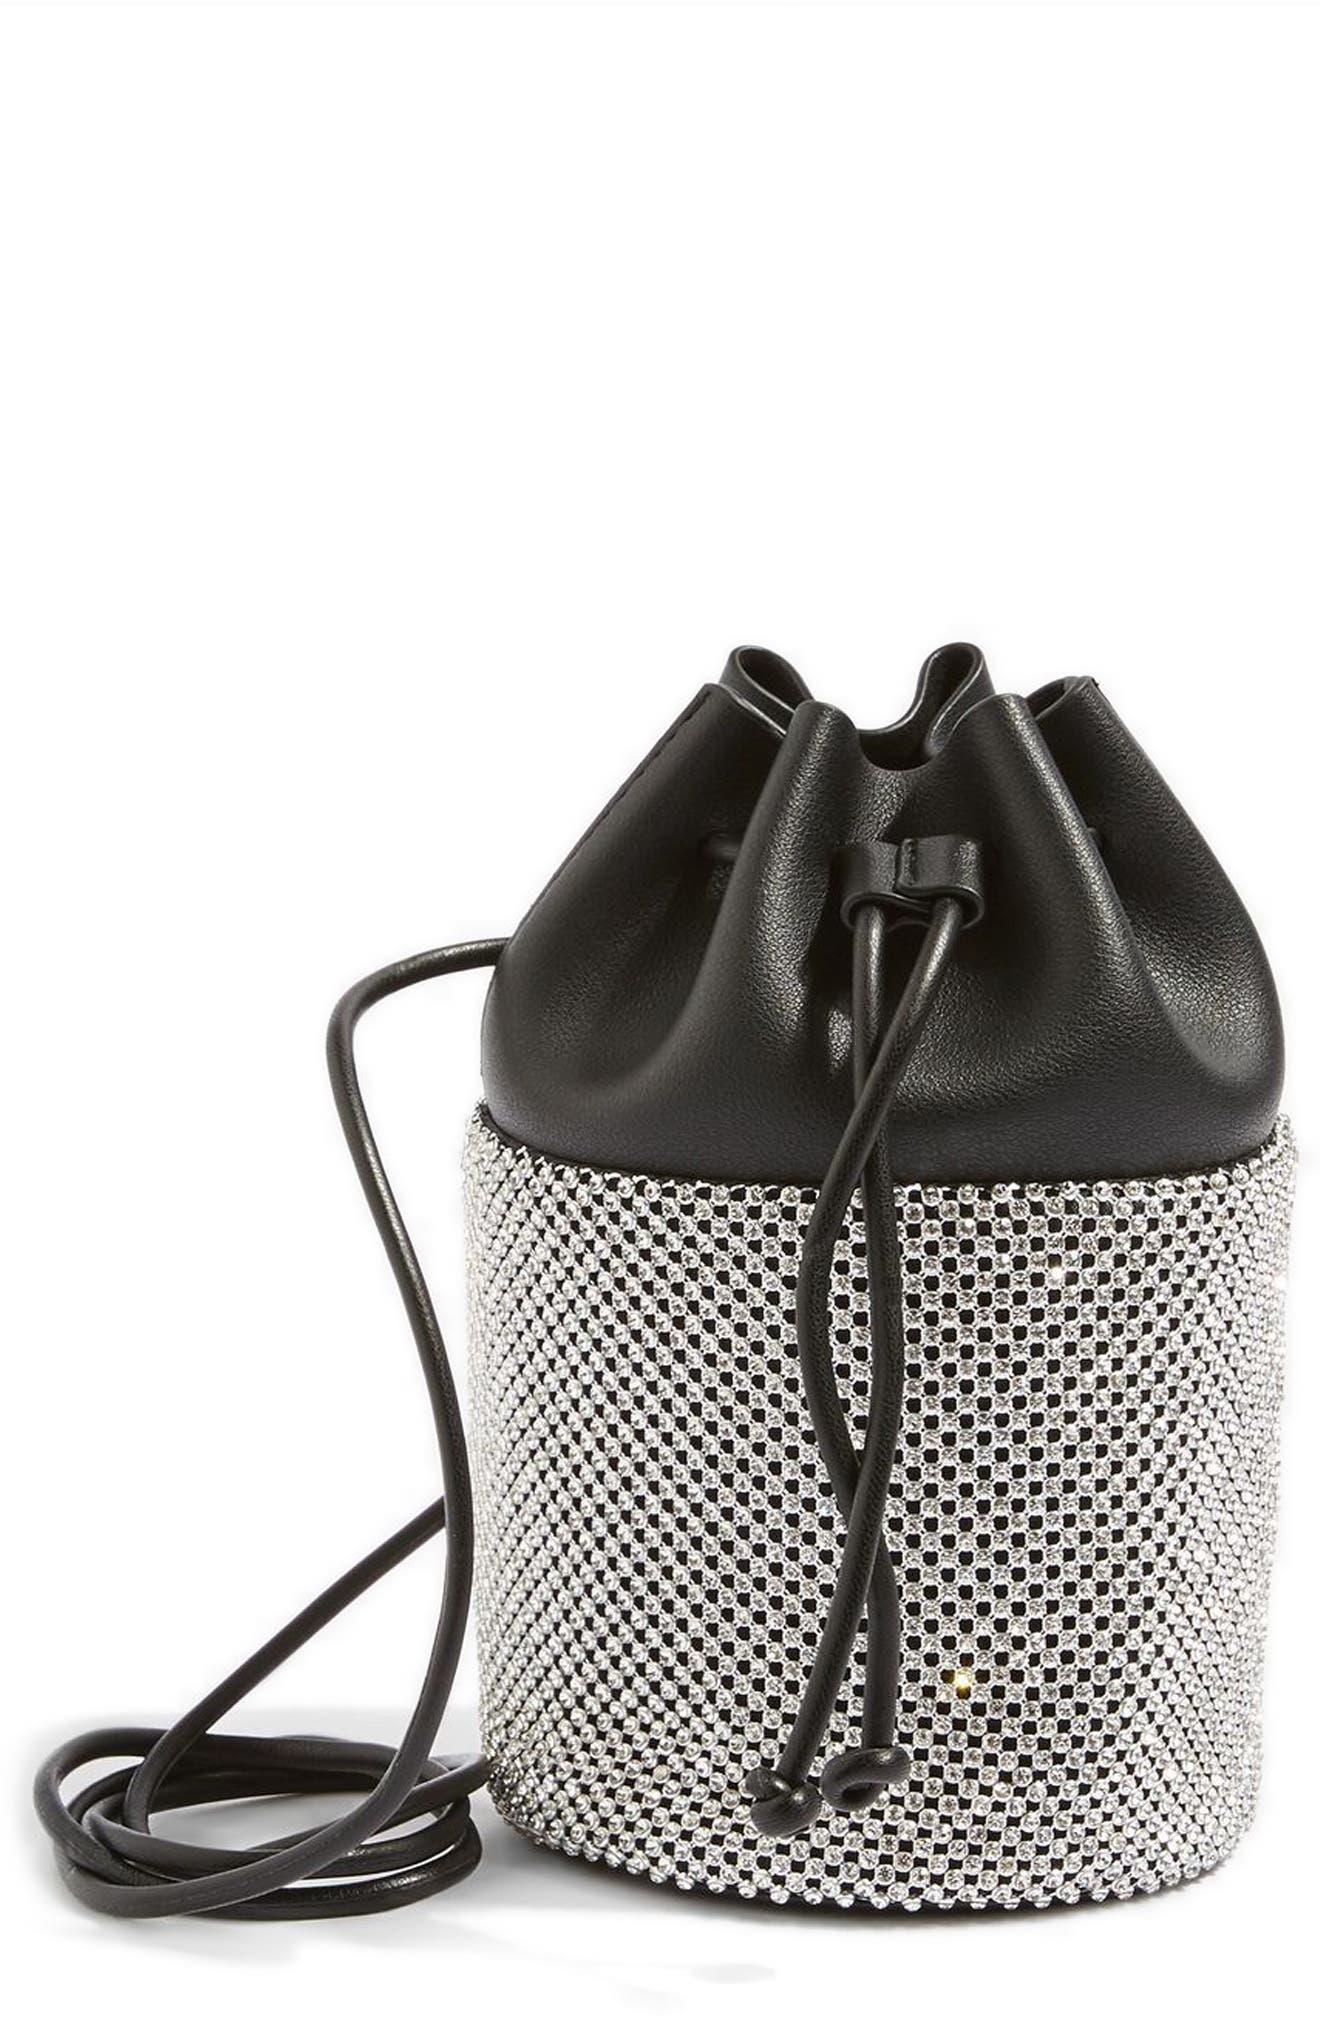 Alternate Image 1 Selected - Topshop Ruben Diamante Faux Leather Bucket Crossbody Bag